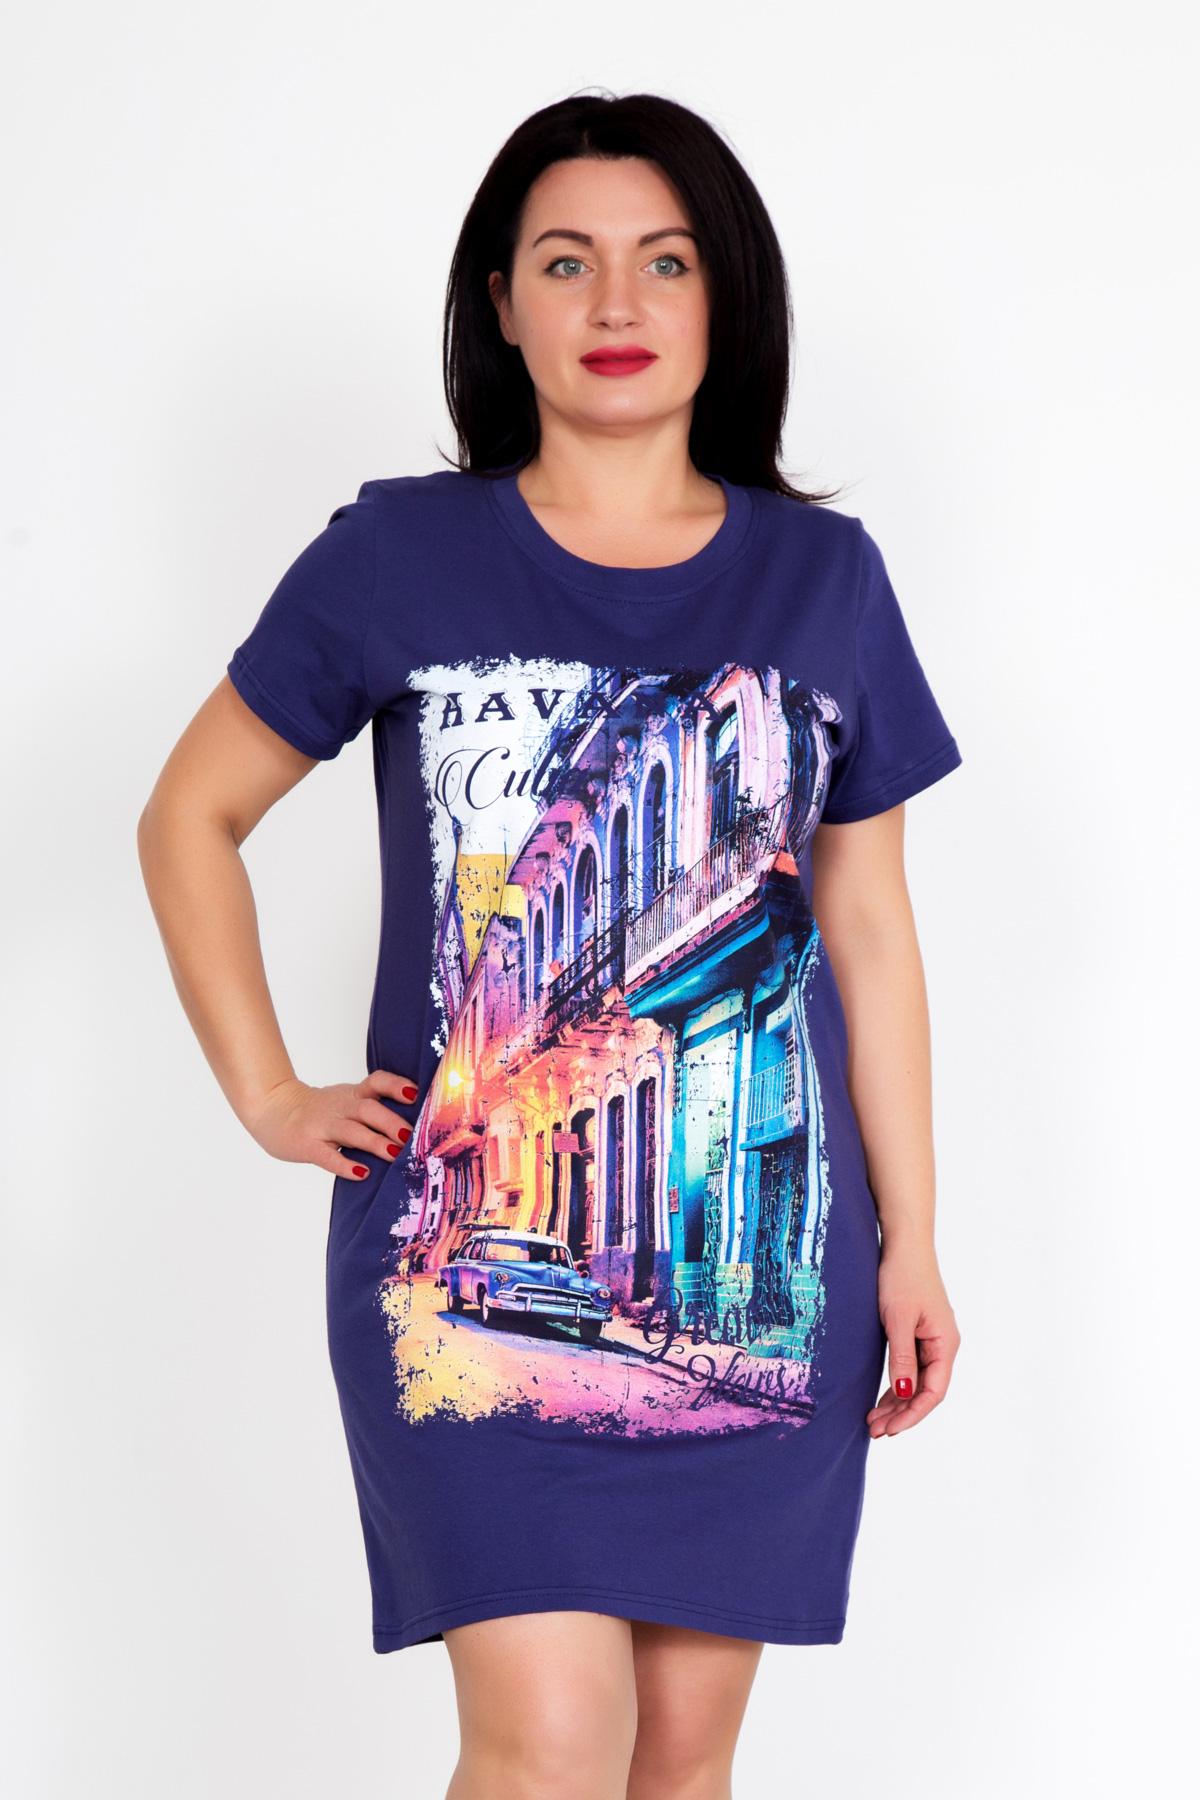 Жен. платье Куба р. 60Платья<br>Факт. ОГ: 124 см <br>Факт. ОТ: 118 см <br>Факт. ОБ: 126 см <br>Длина по спинке: 98 см<br><br>Тип: Жен. платье<br>Размер: 60<br>Материал: Кулирка